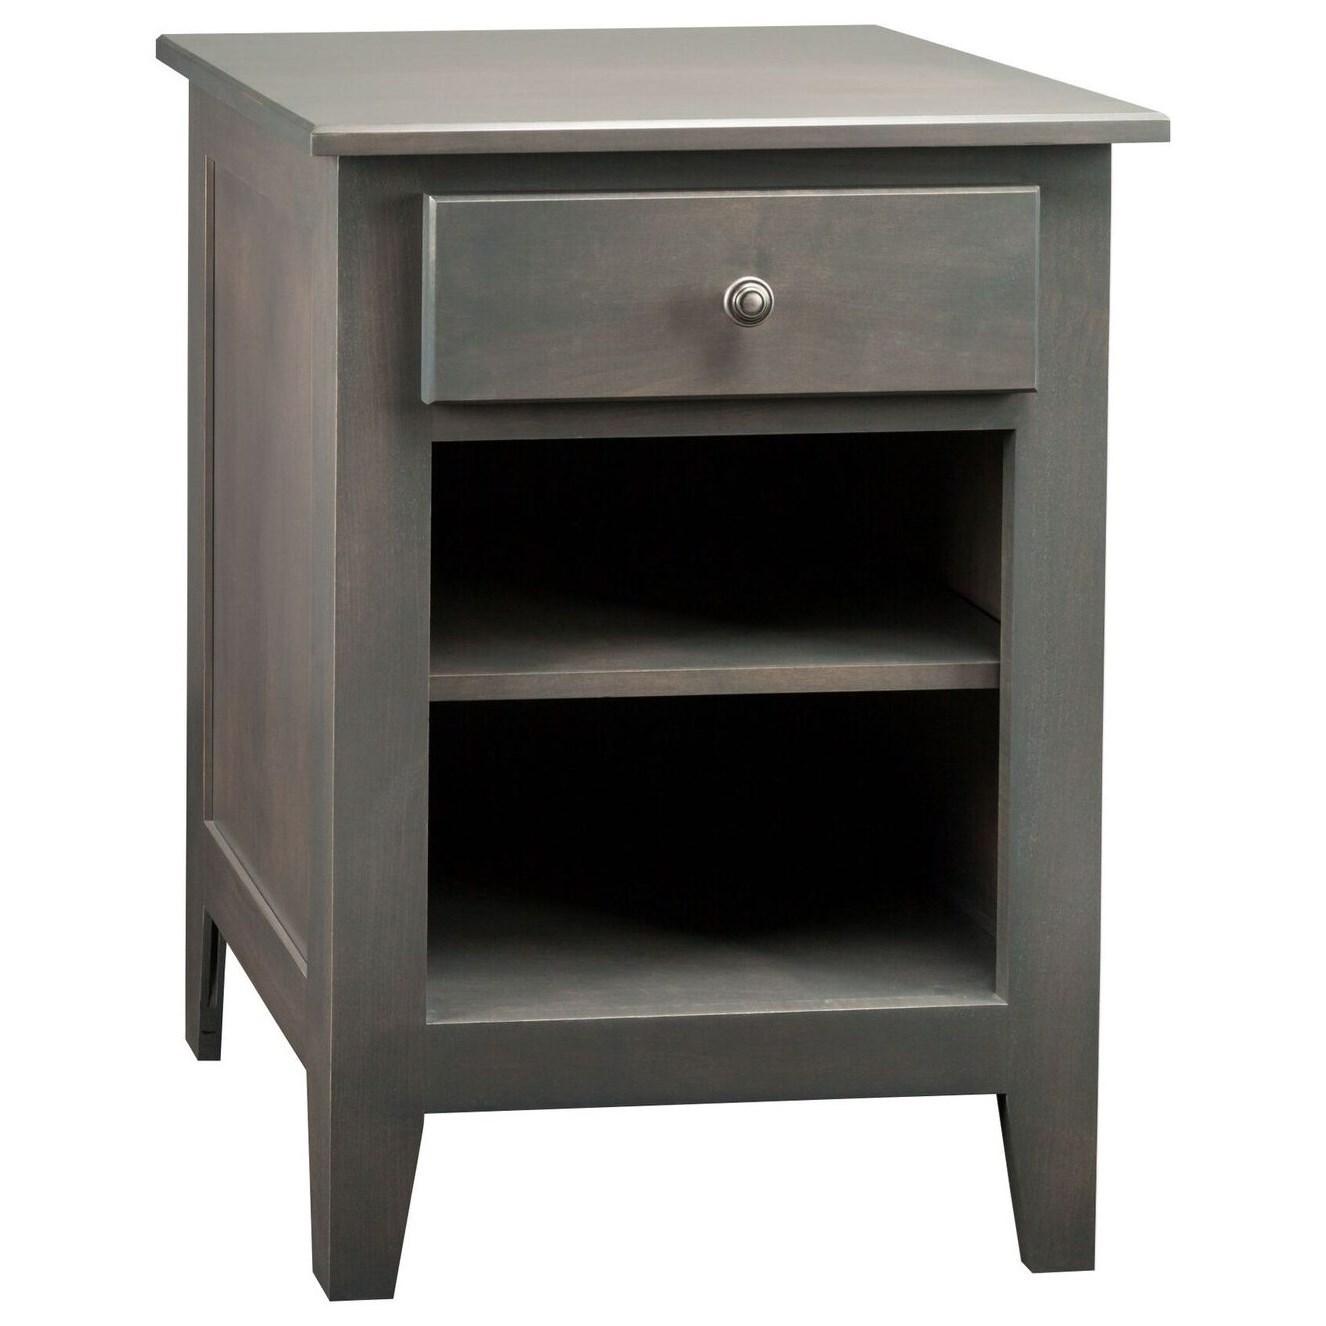 Mapleton 1-Drawer 1-Shelf Nightstand by Daniel's Amish at Saugerties Furniture Mart